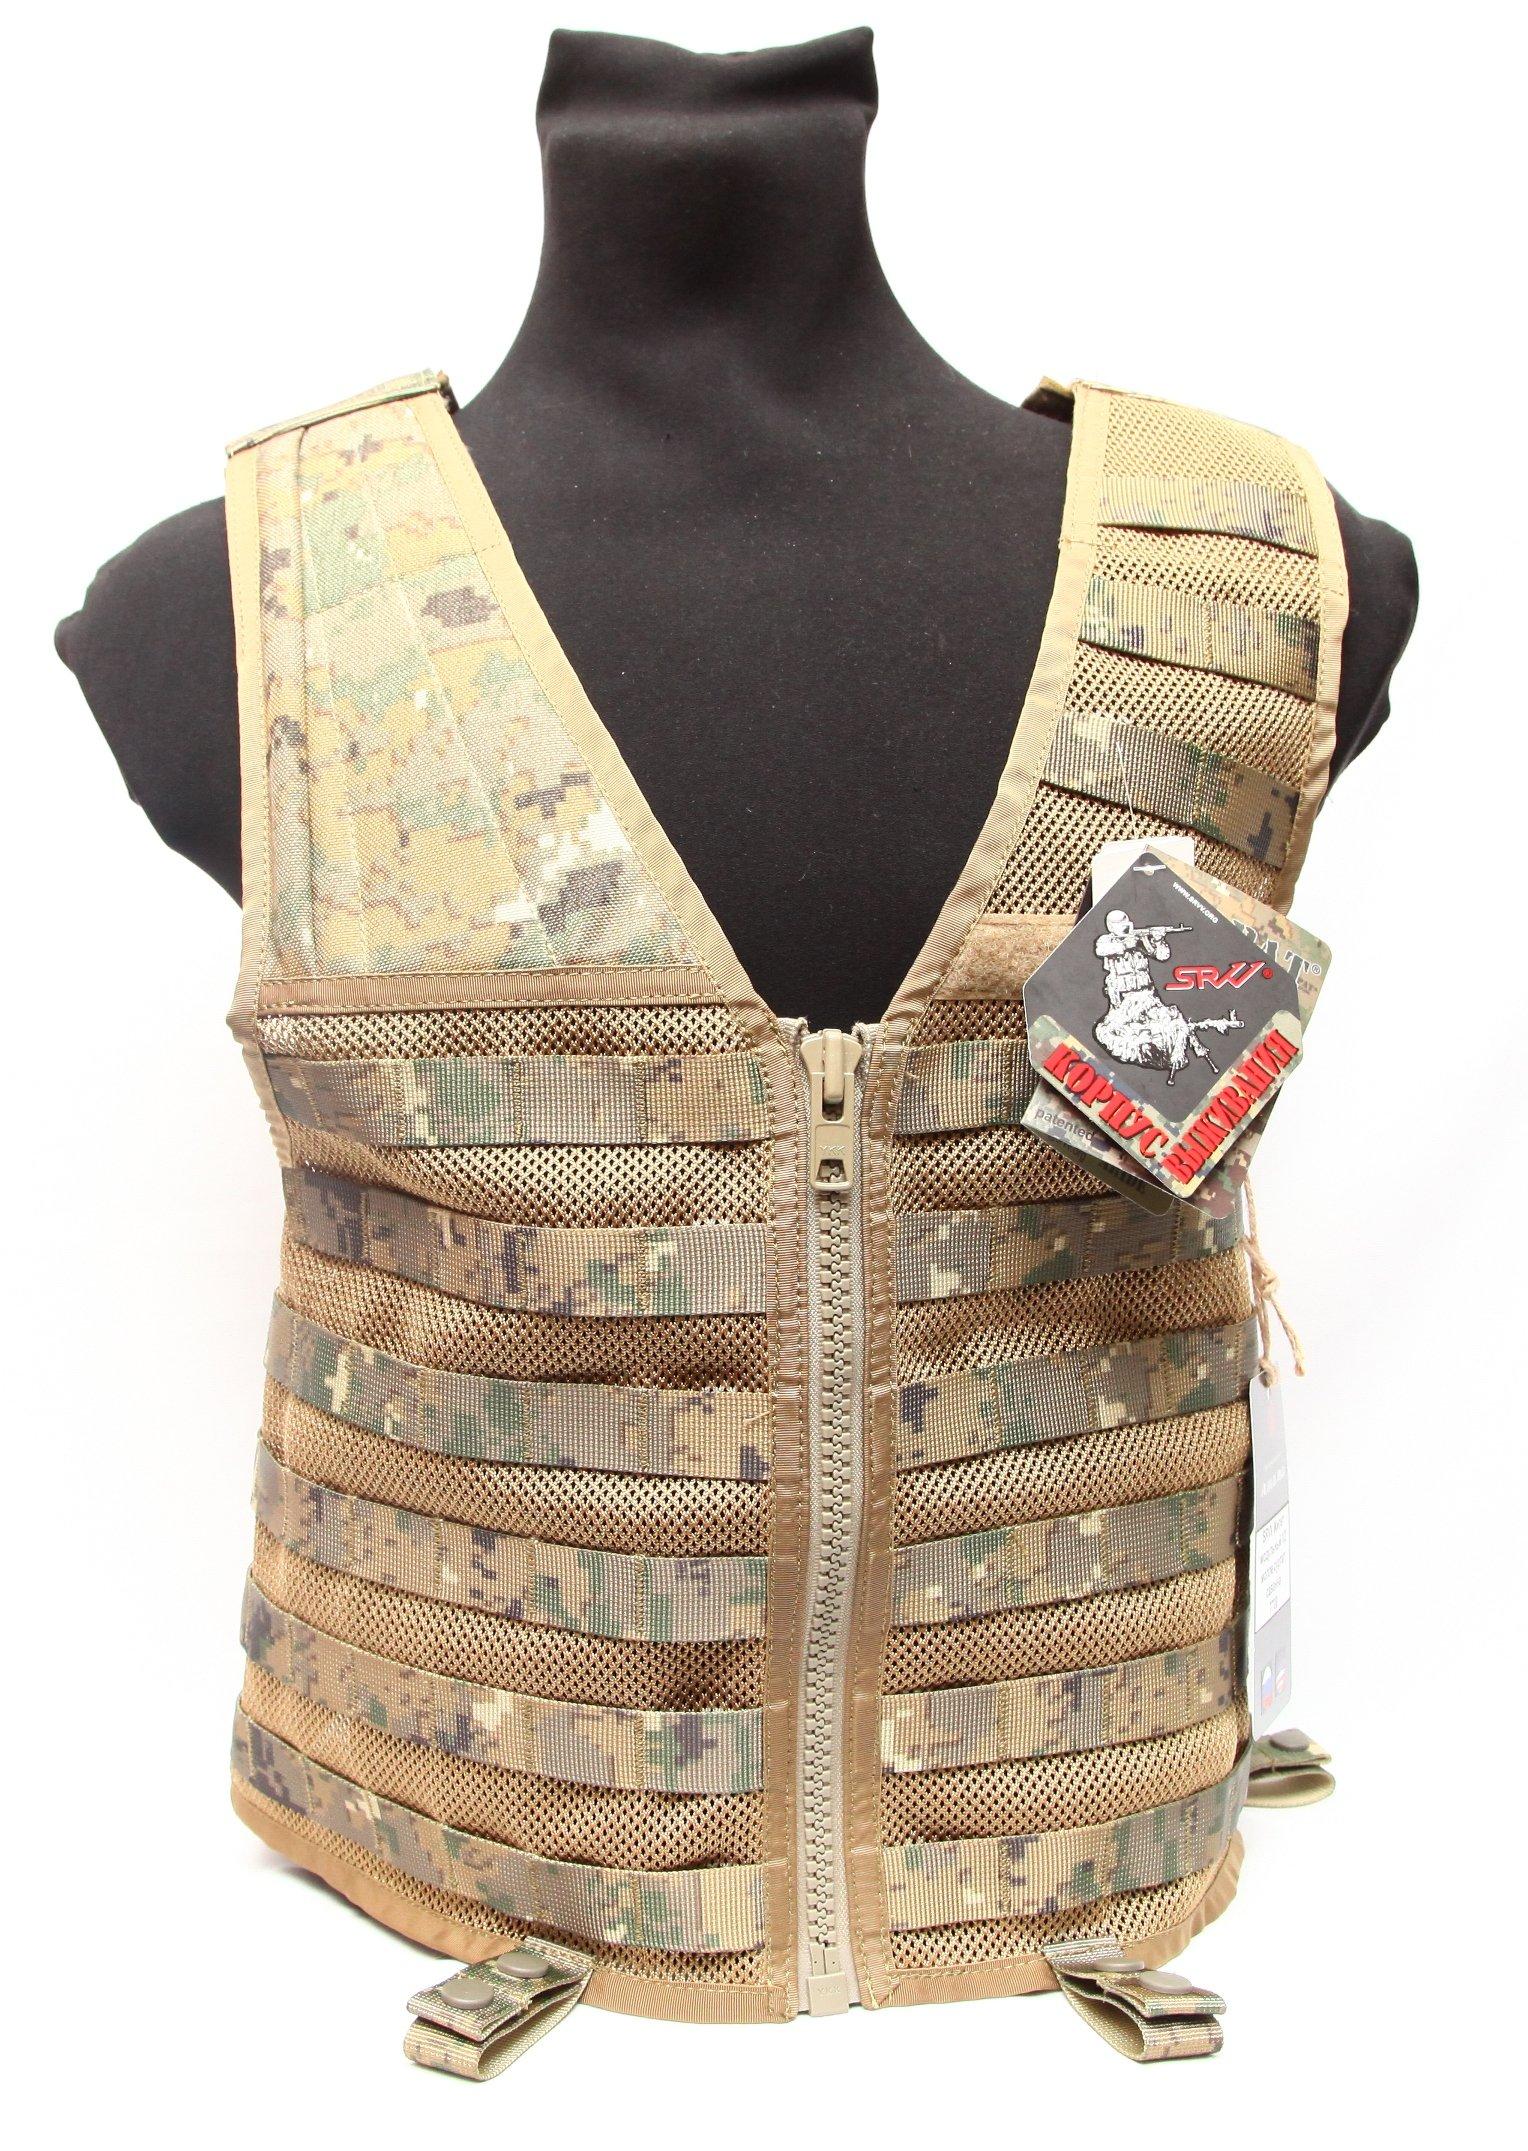 Tactical army military Russian SRVV spetsnaz molle vest surpat arid savanna